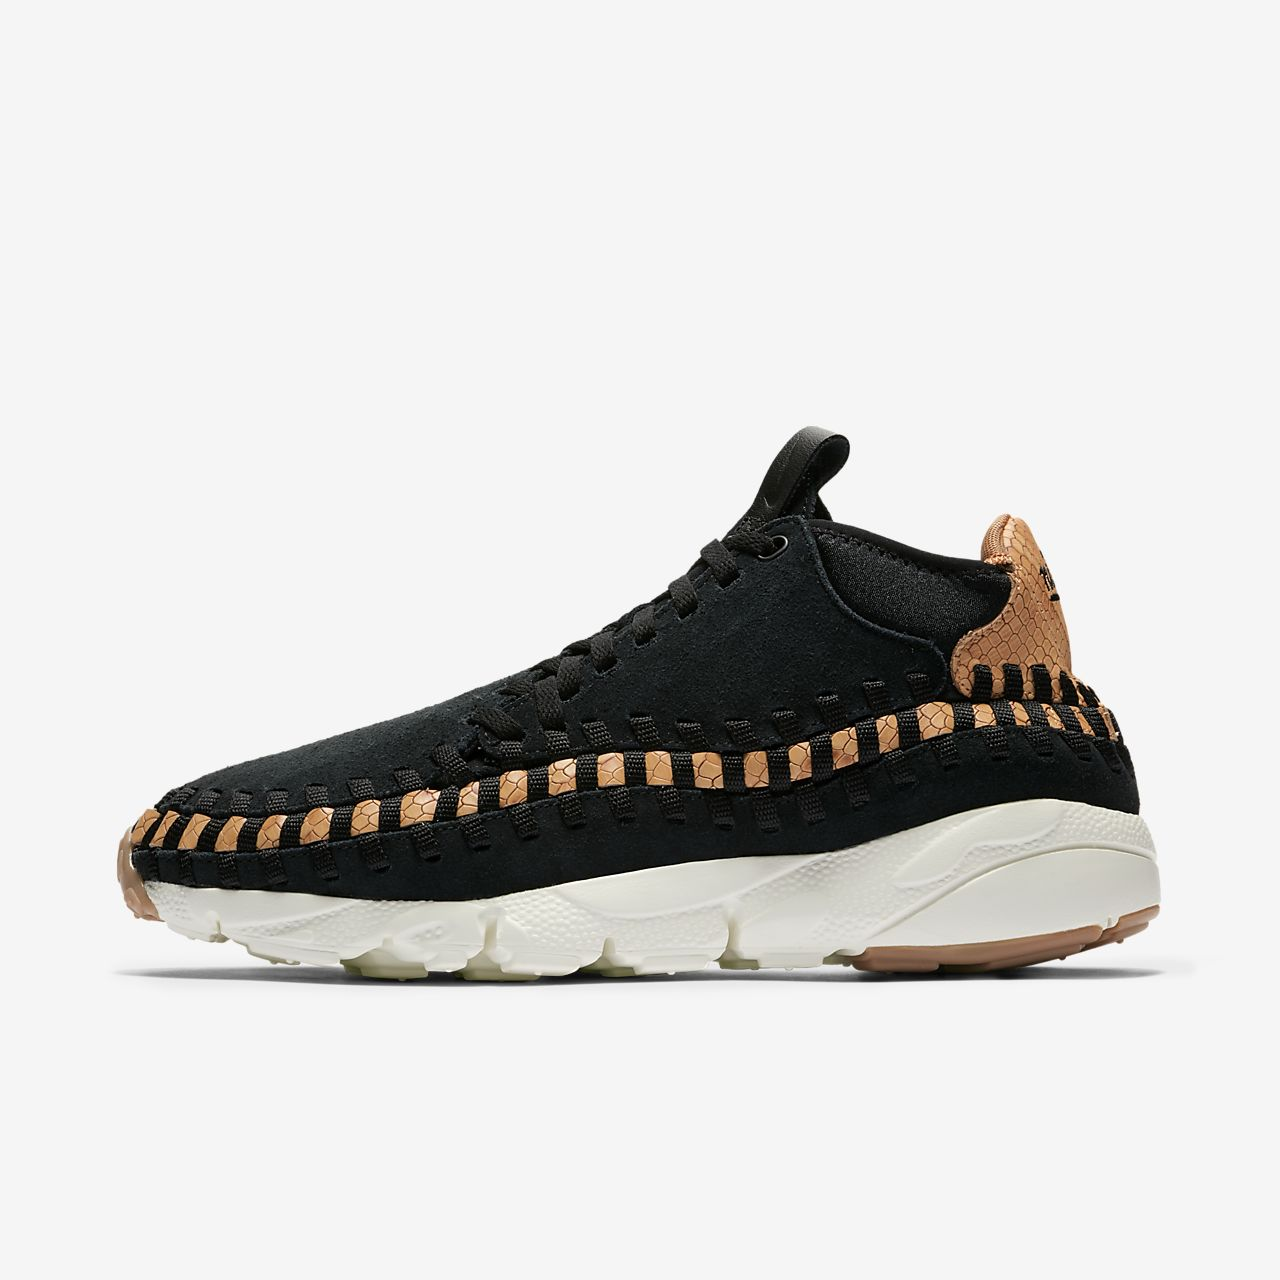 ... Nike Air Footscape Woven Chukka Premium Herenschoen